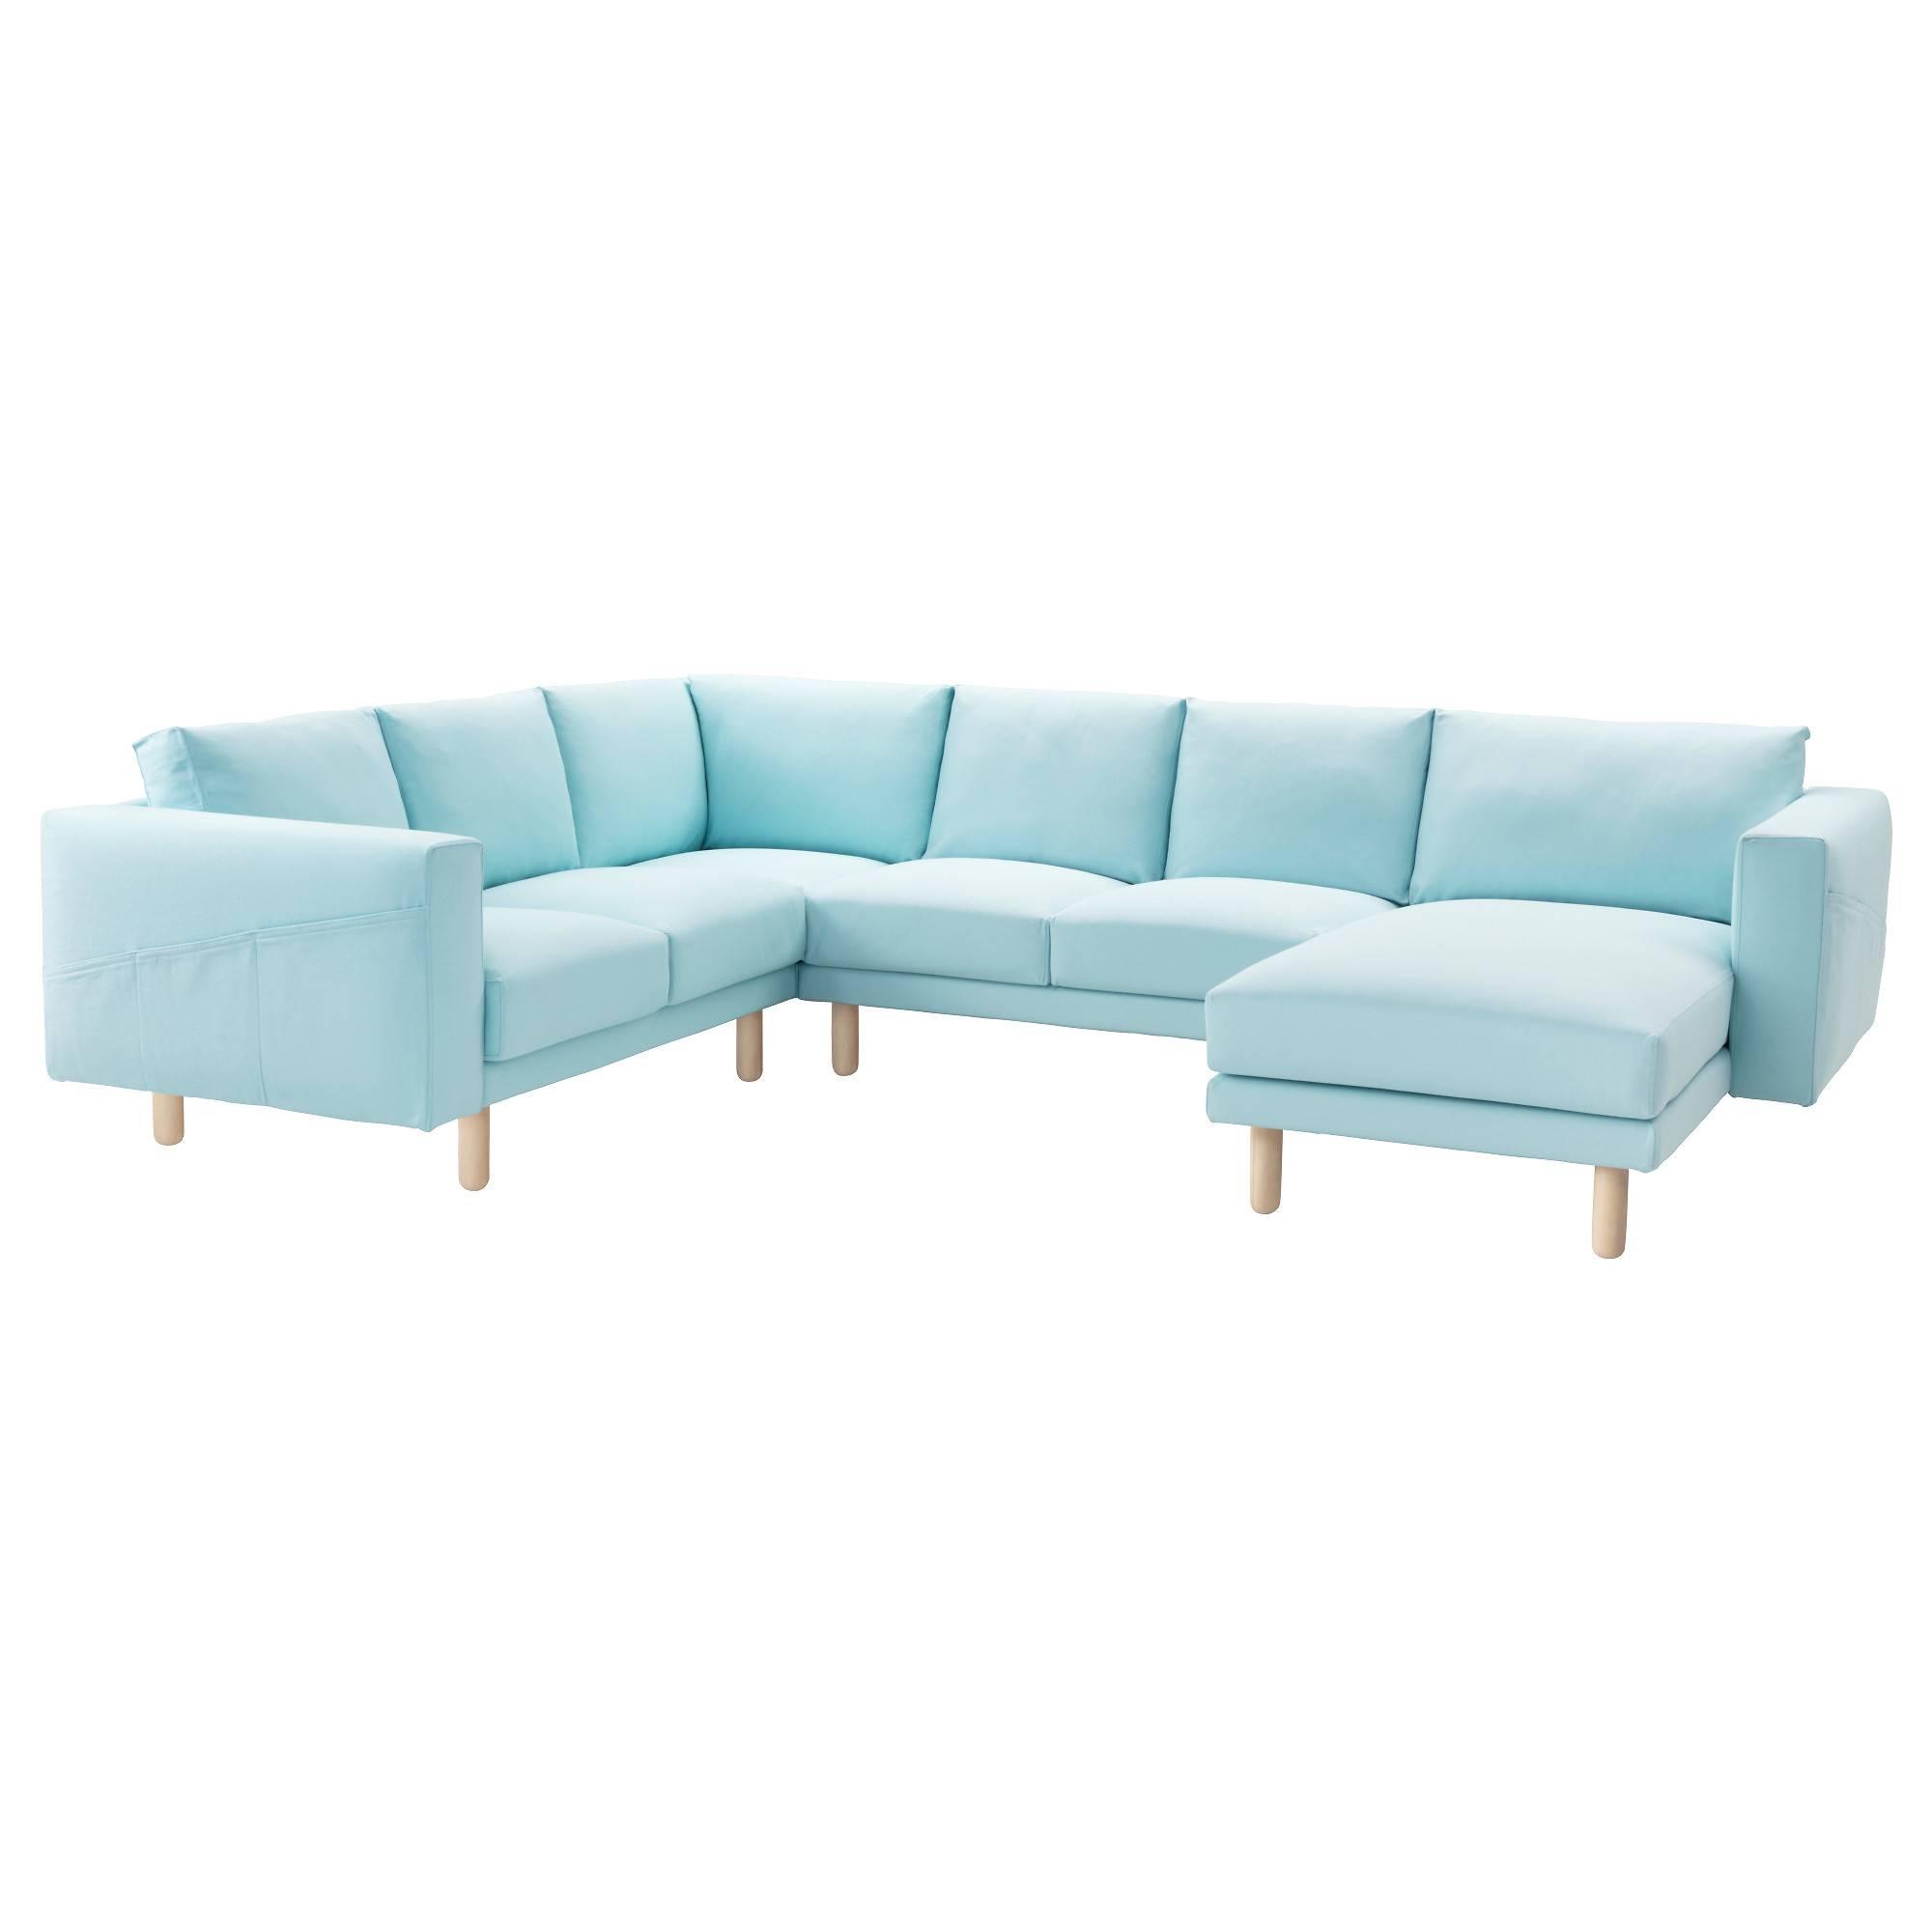 Fabric Corner Sofas | Ikea intended for 2X2 Corner Sofas (Image 10 of 30)